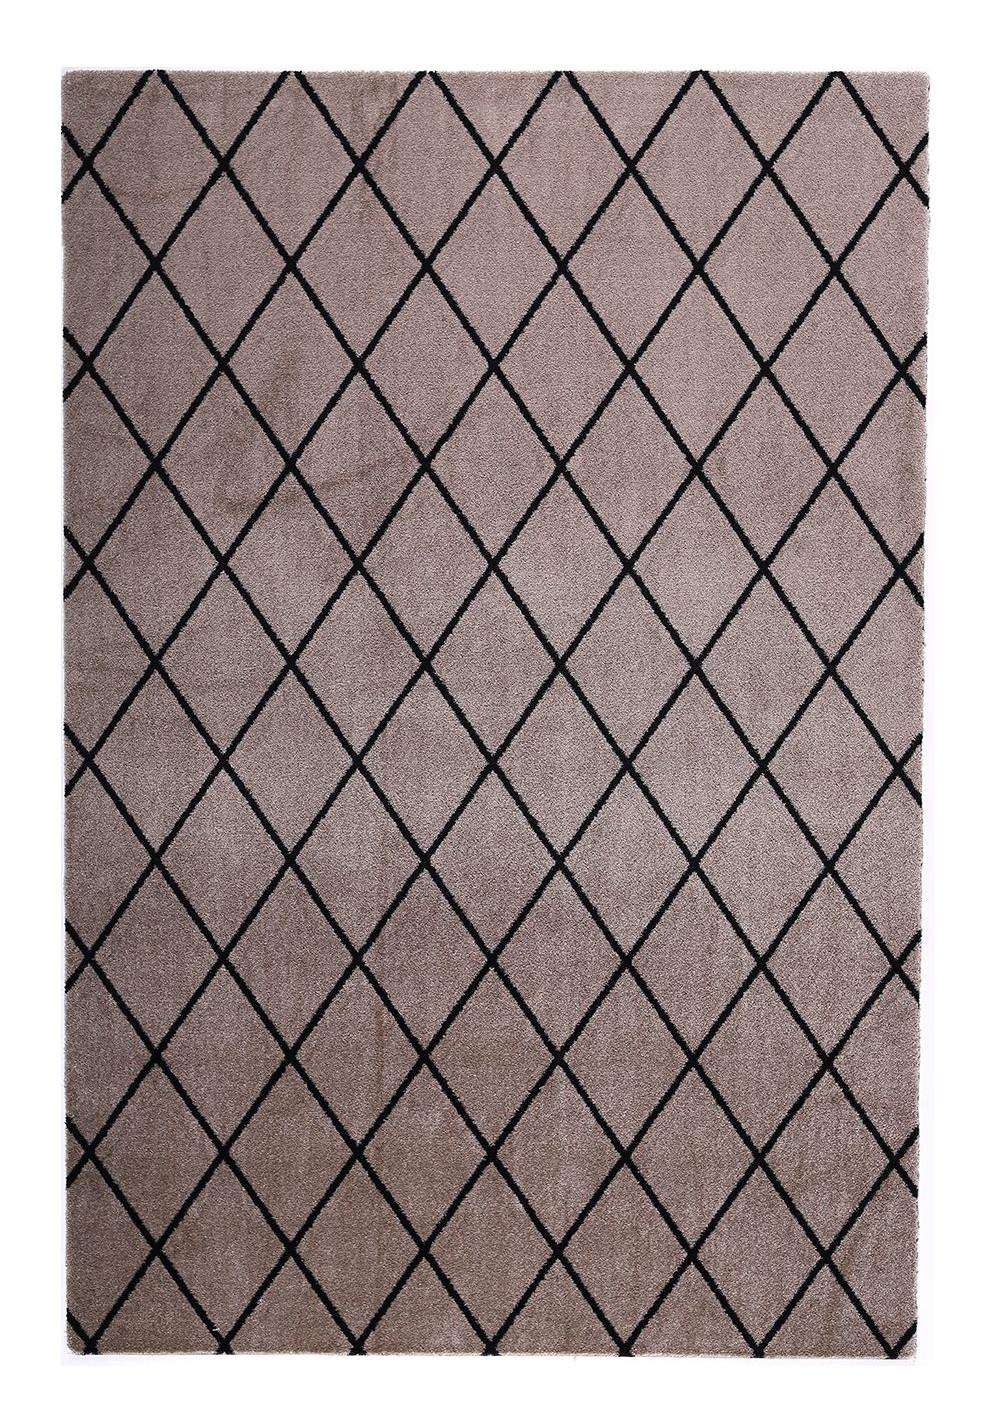 VM Carpet Salmiakki matto 06 beige-black